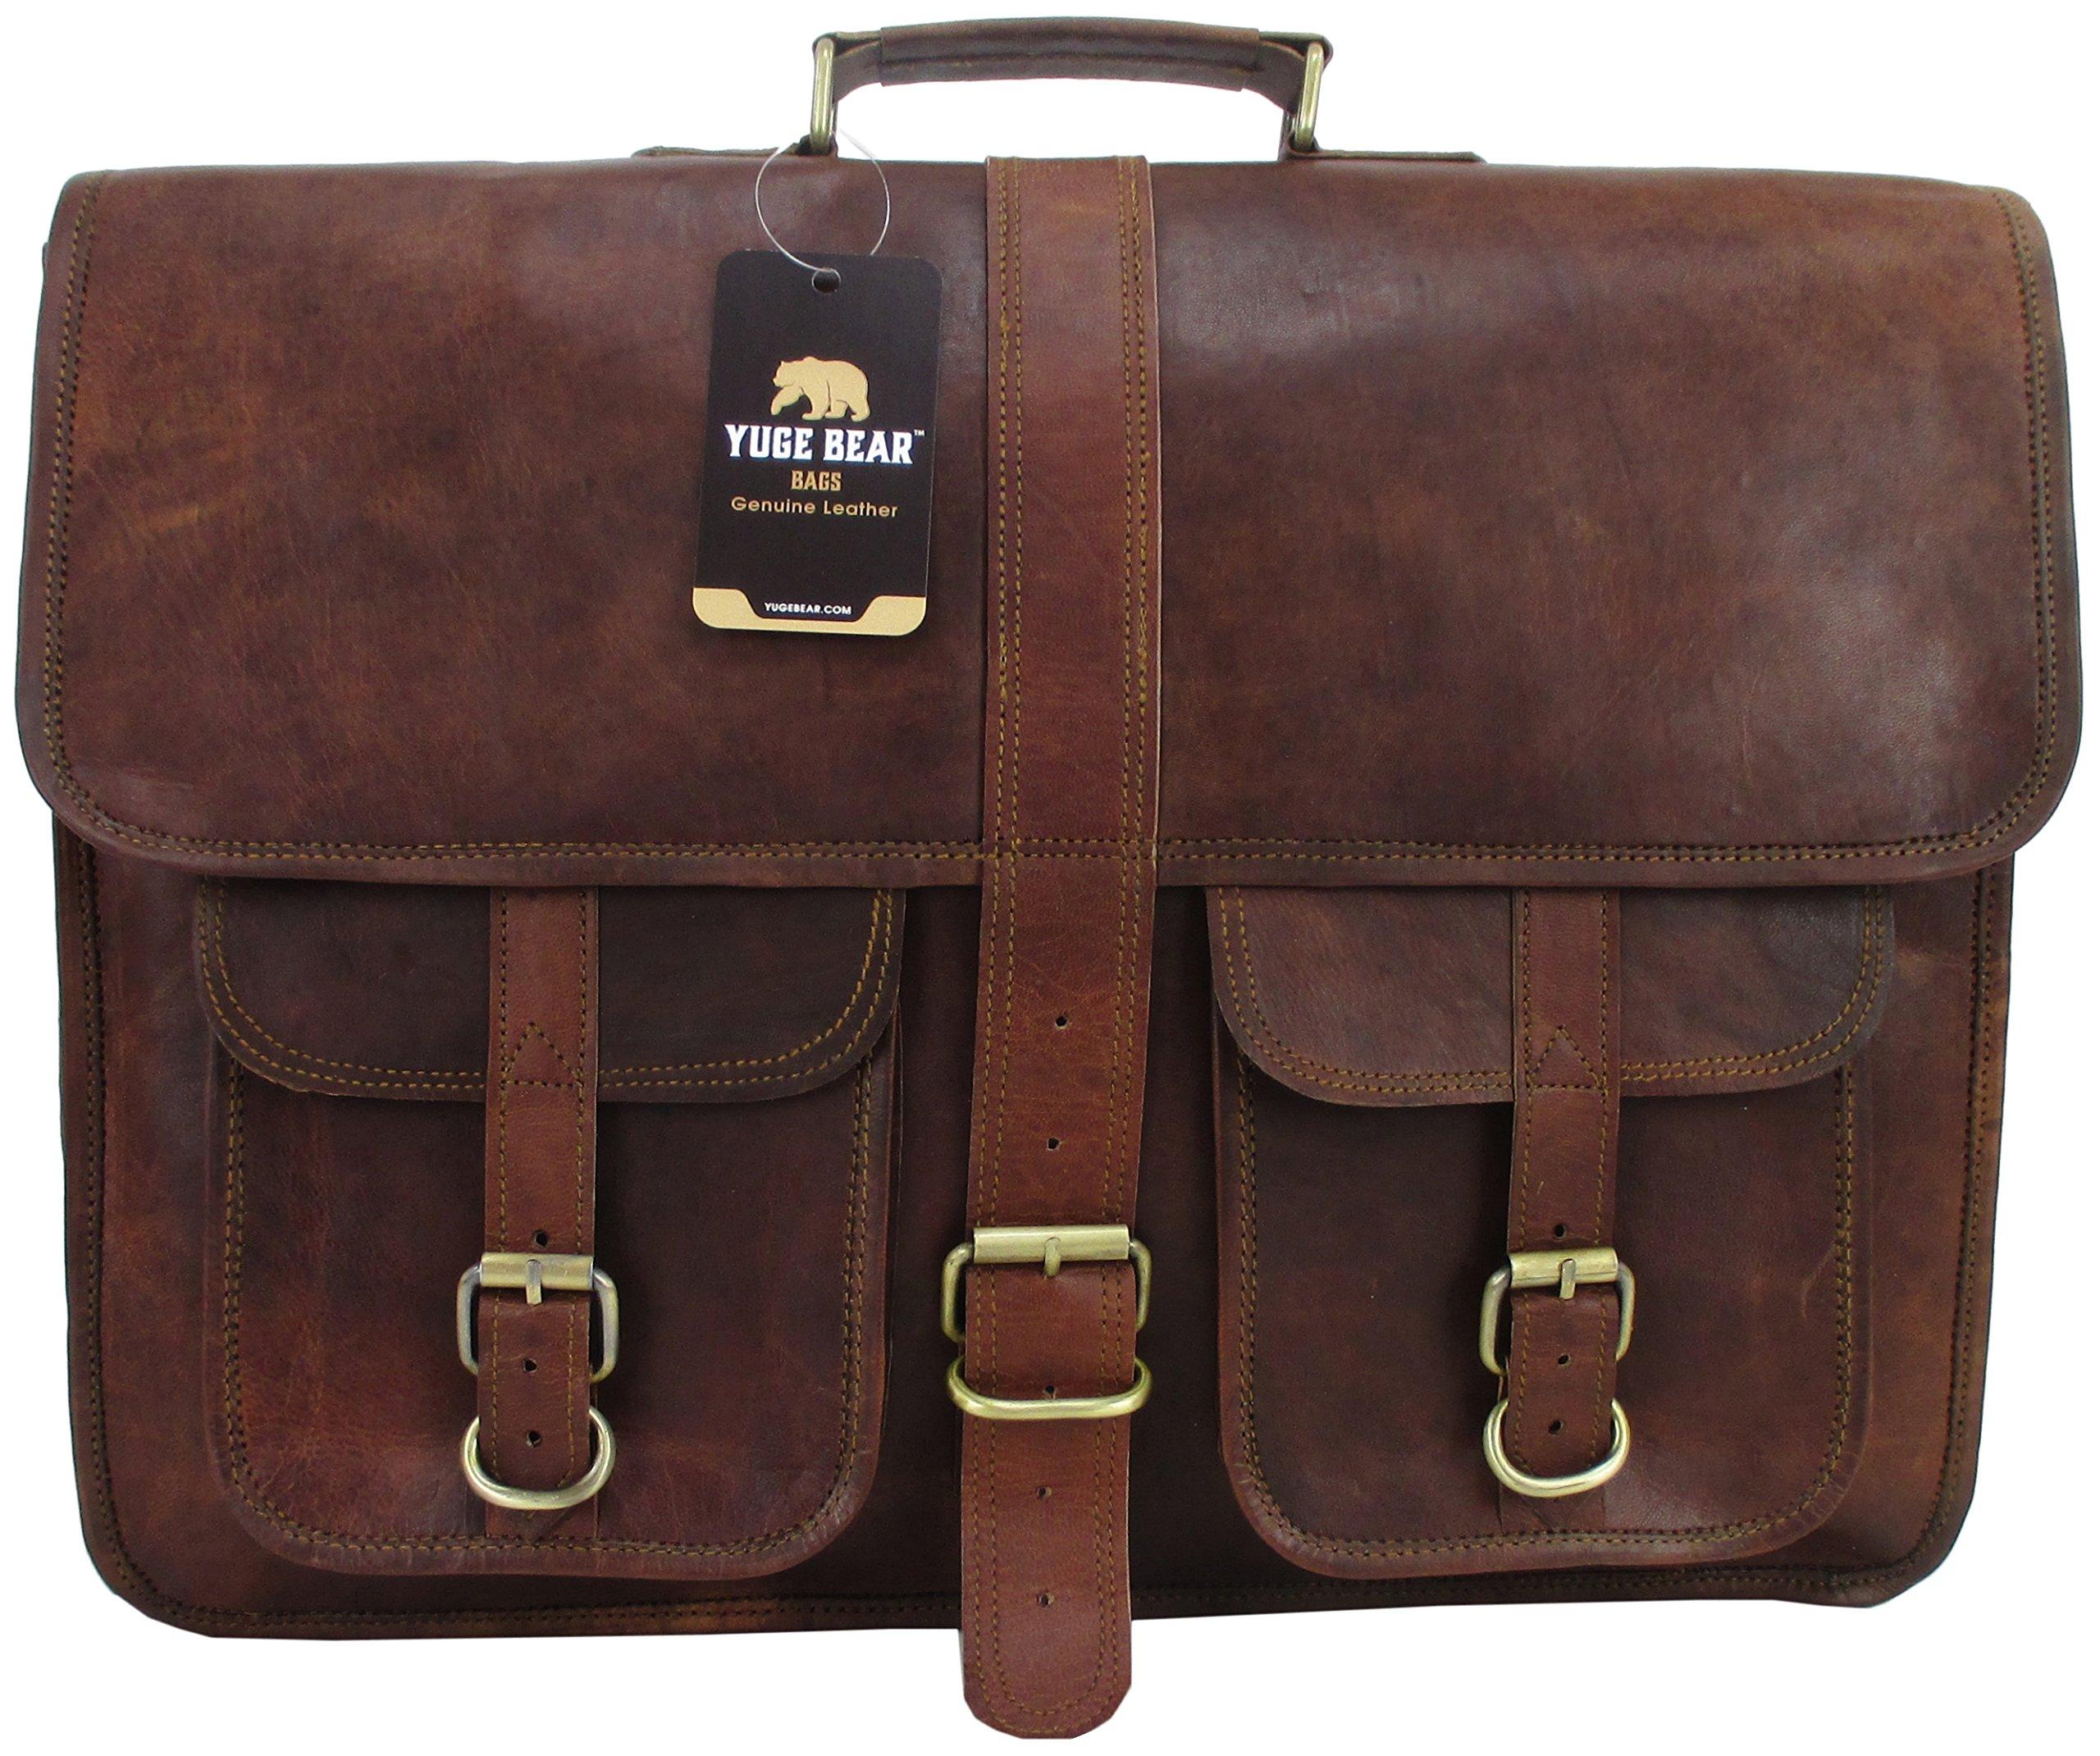 Yuge Bear 18'' B2P Mens Vintage Style Genuine Leather Laptop Bag Briefcase